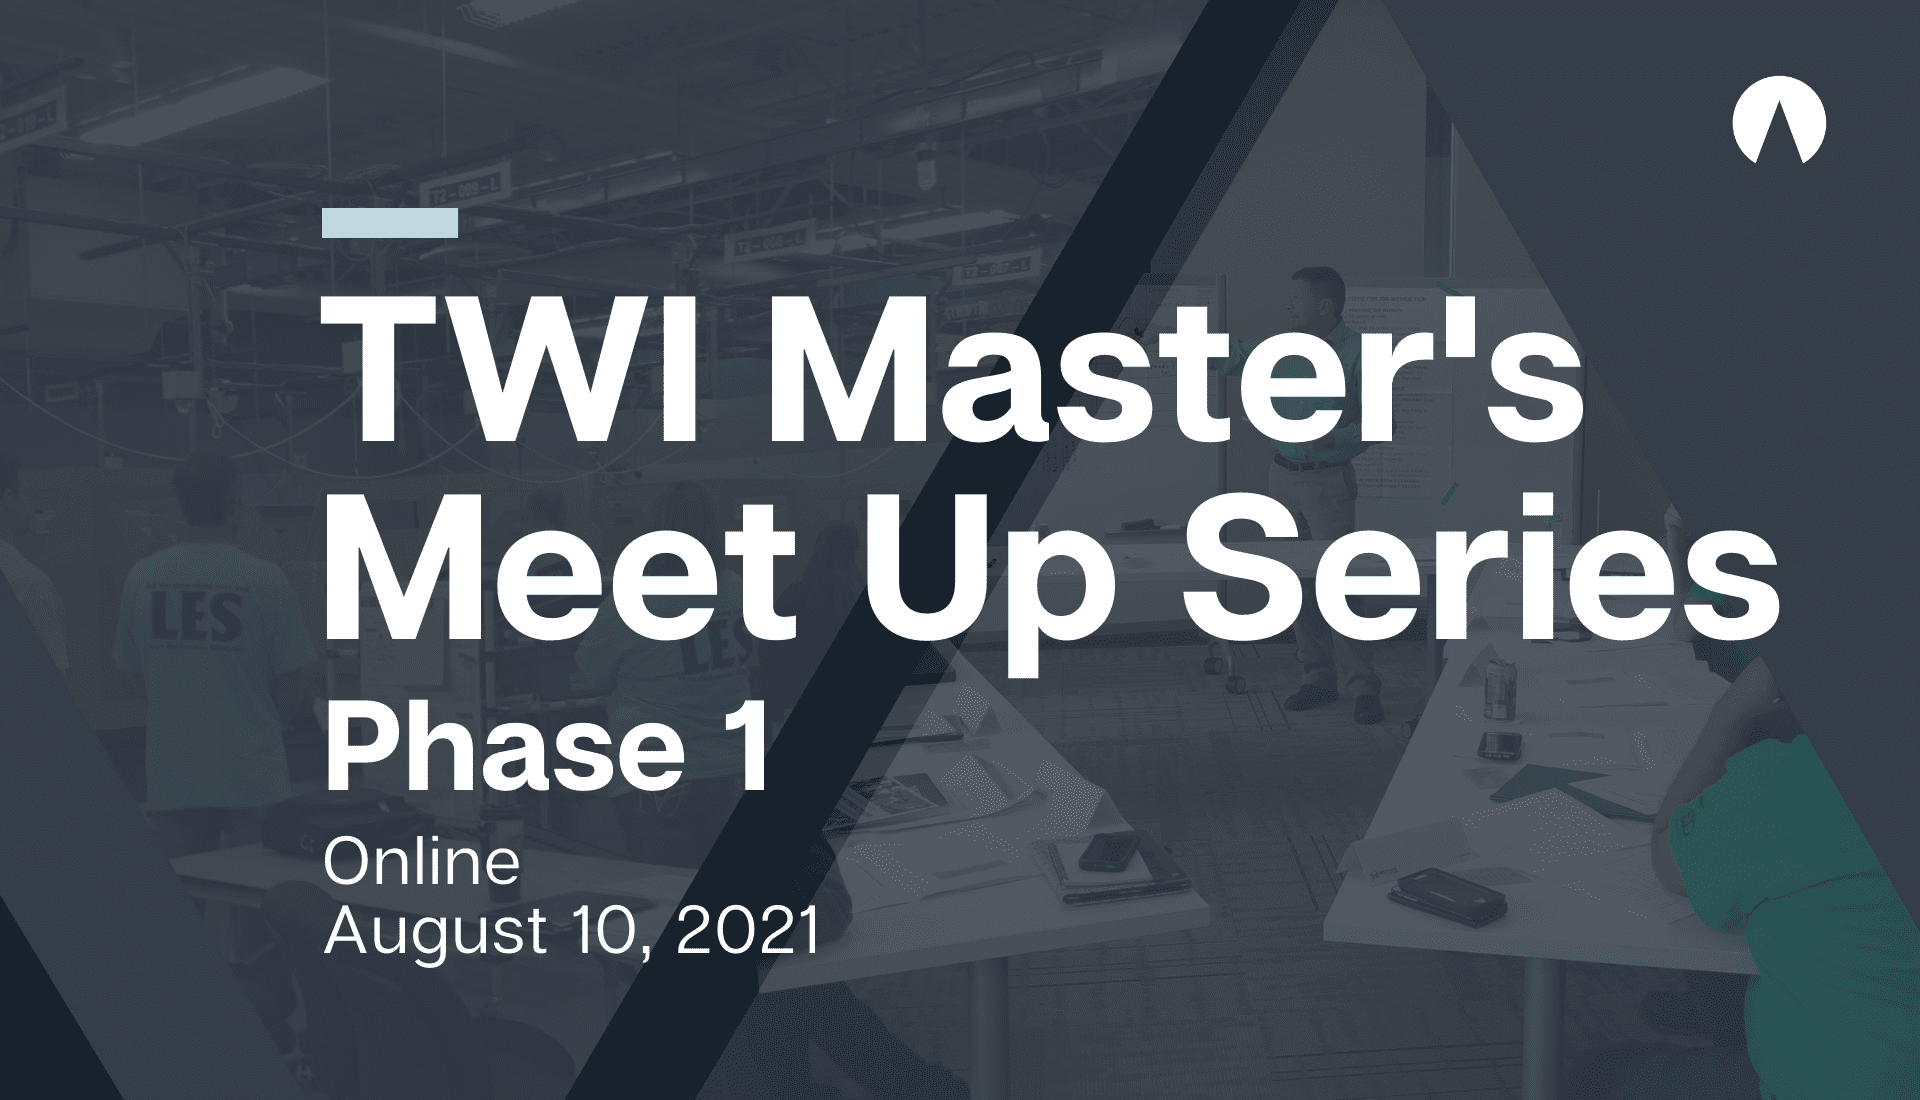 TWI Master's Meet Up: Phase 1